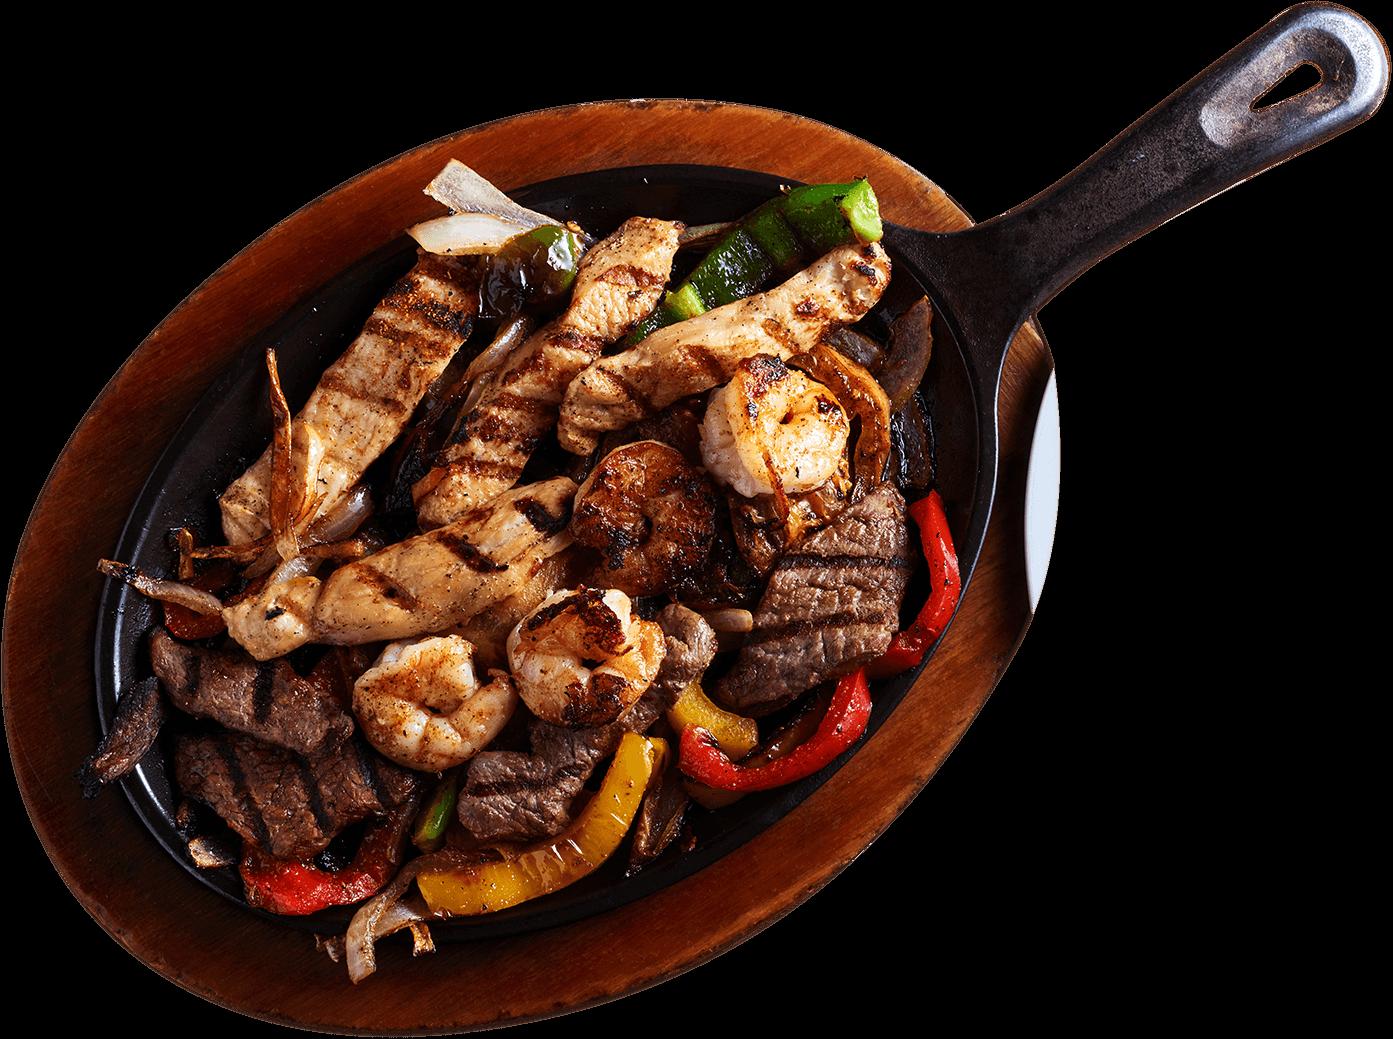 La Carreta's sizzling steak fajitas on a skillet.